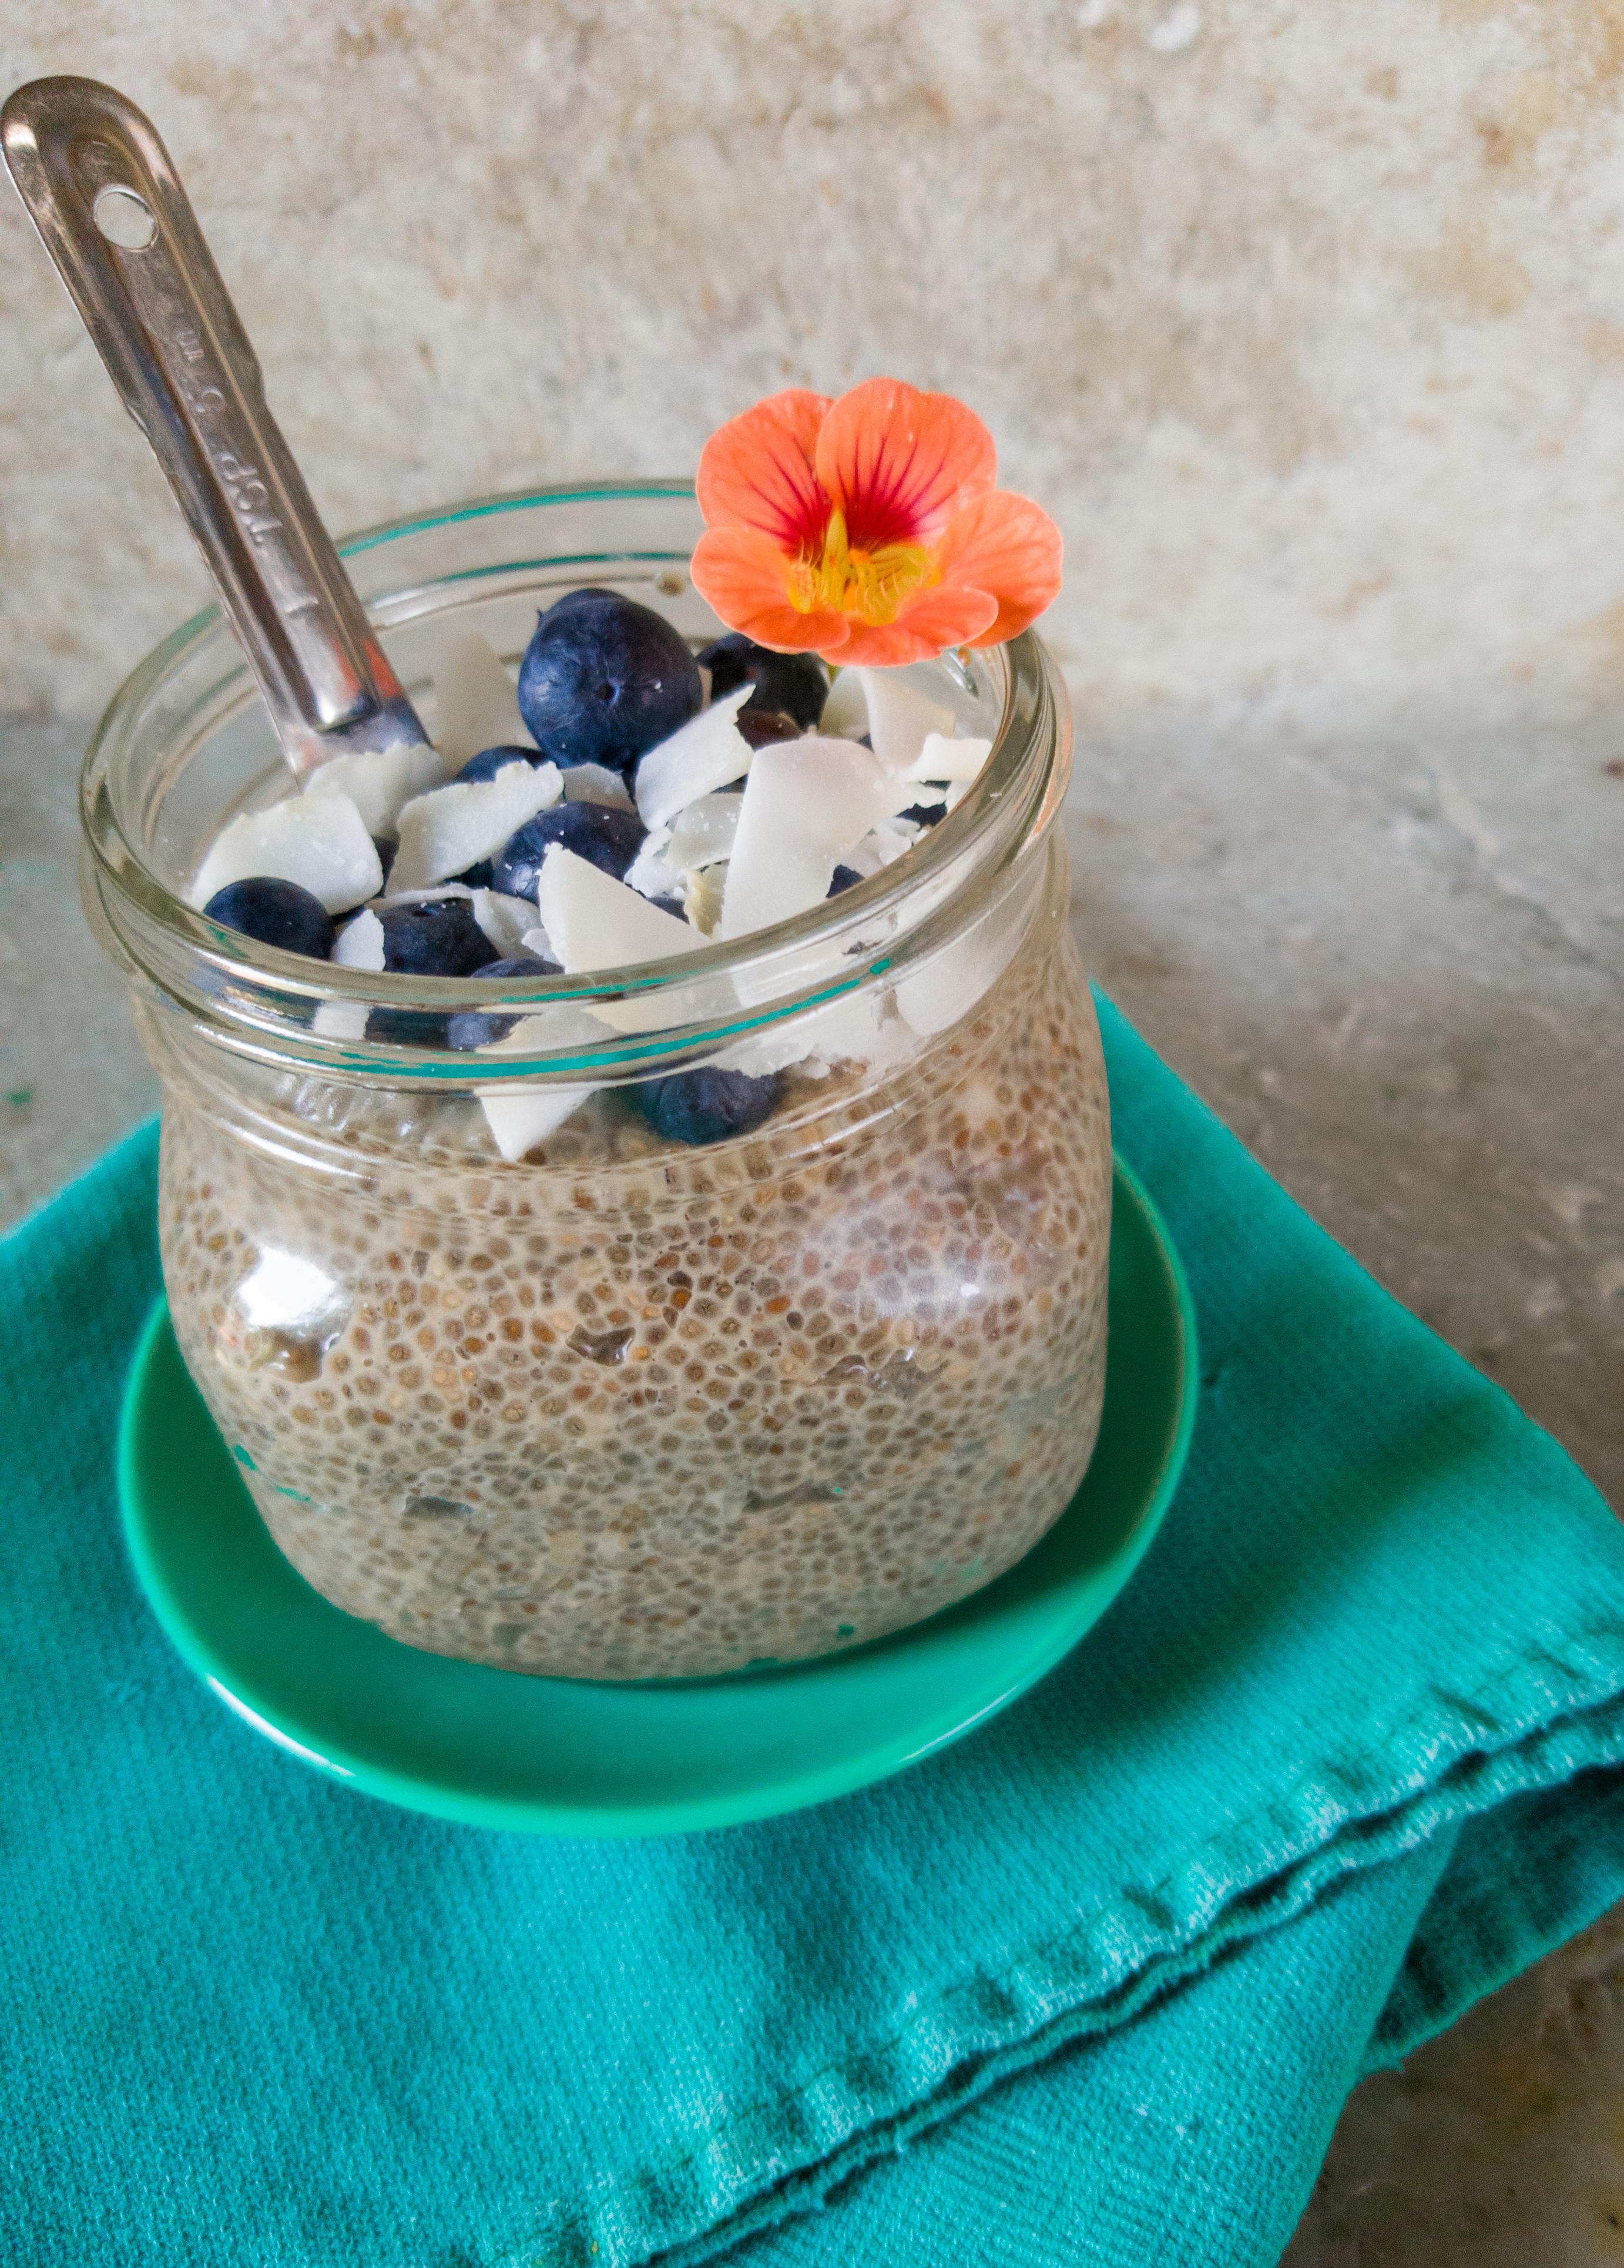 Vegan/Gluten Free Chia Seed Pudding